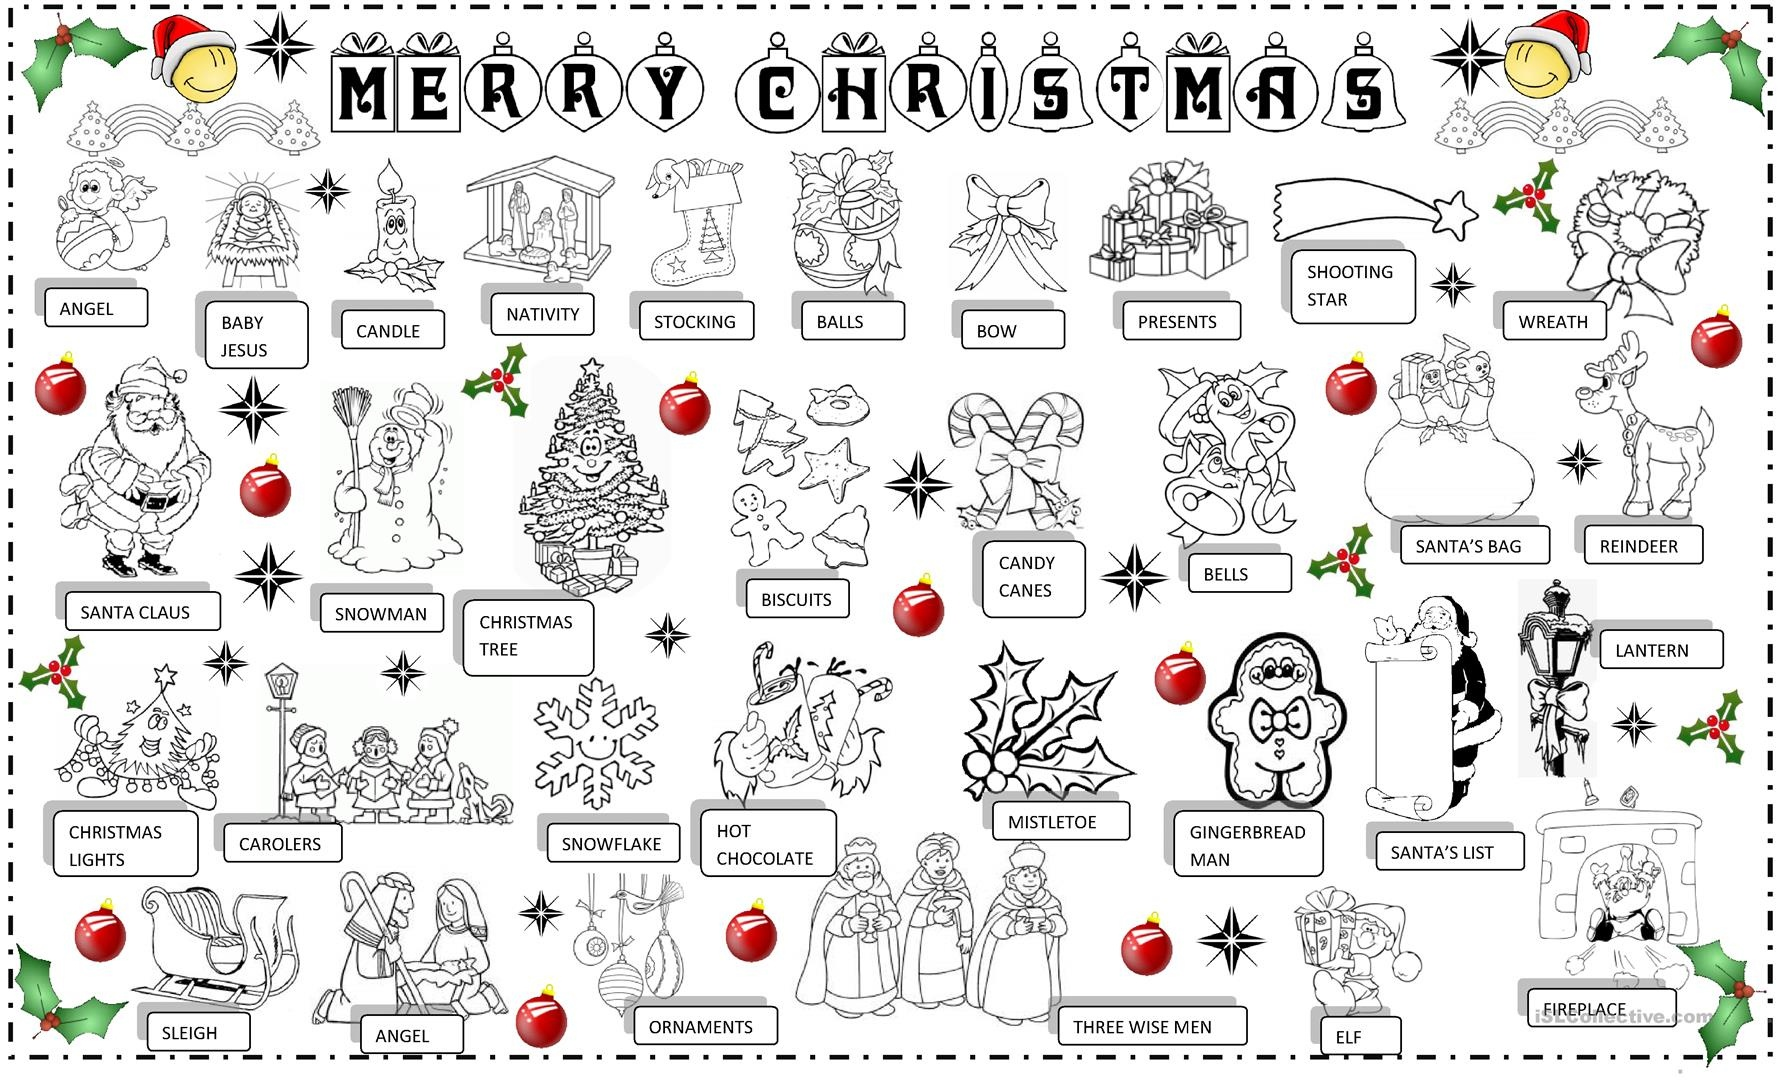 Christmas Pictionary Worksheet - Free Esl Printable Worksheets Made - Free Printable Christmas Pictionary Cards